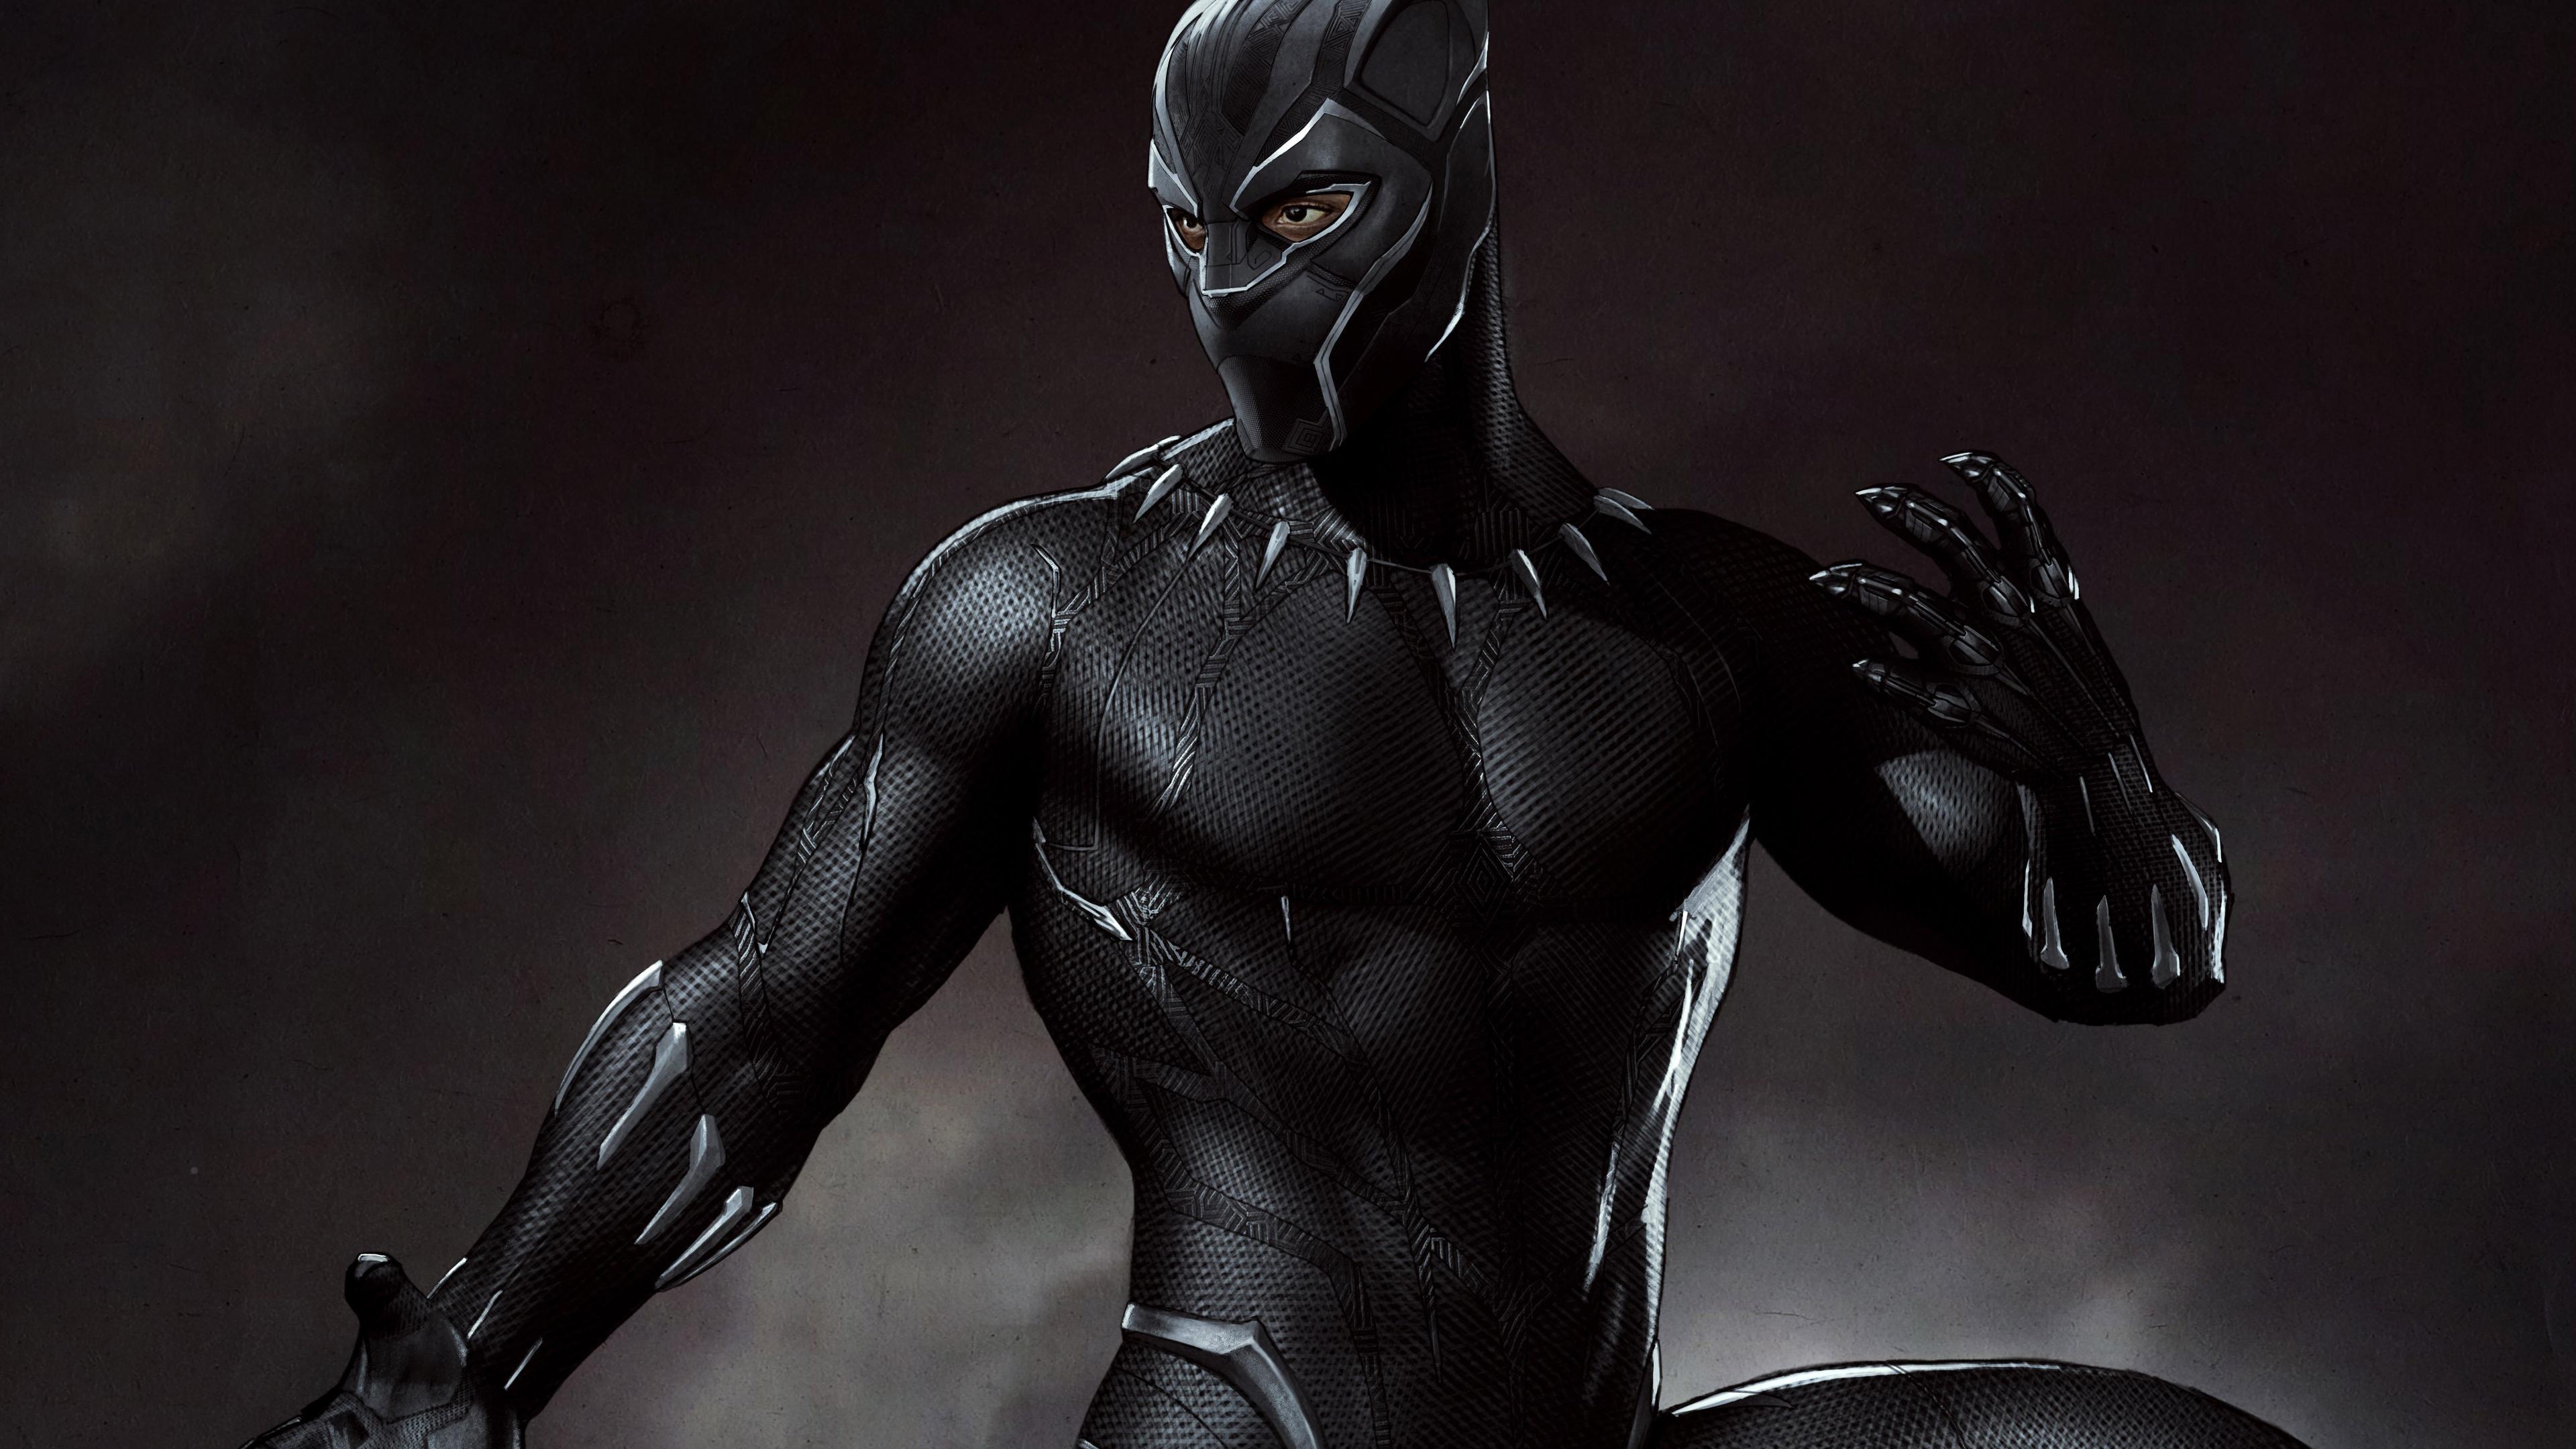 3840x2160 Black Panther 5k Artwork 4k HD 4k Wallpapers ...